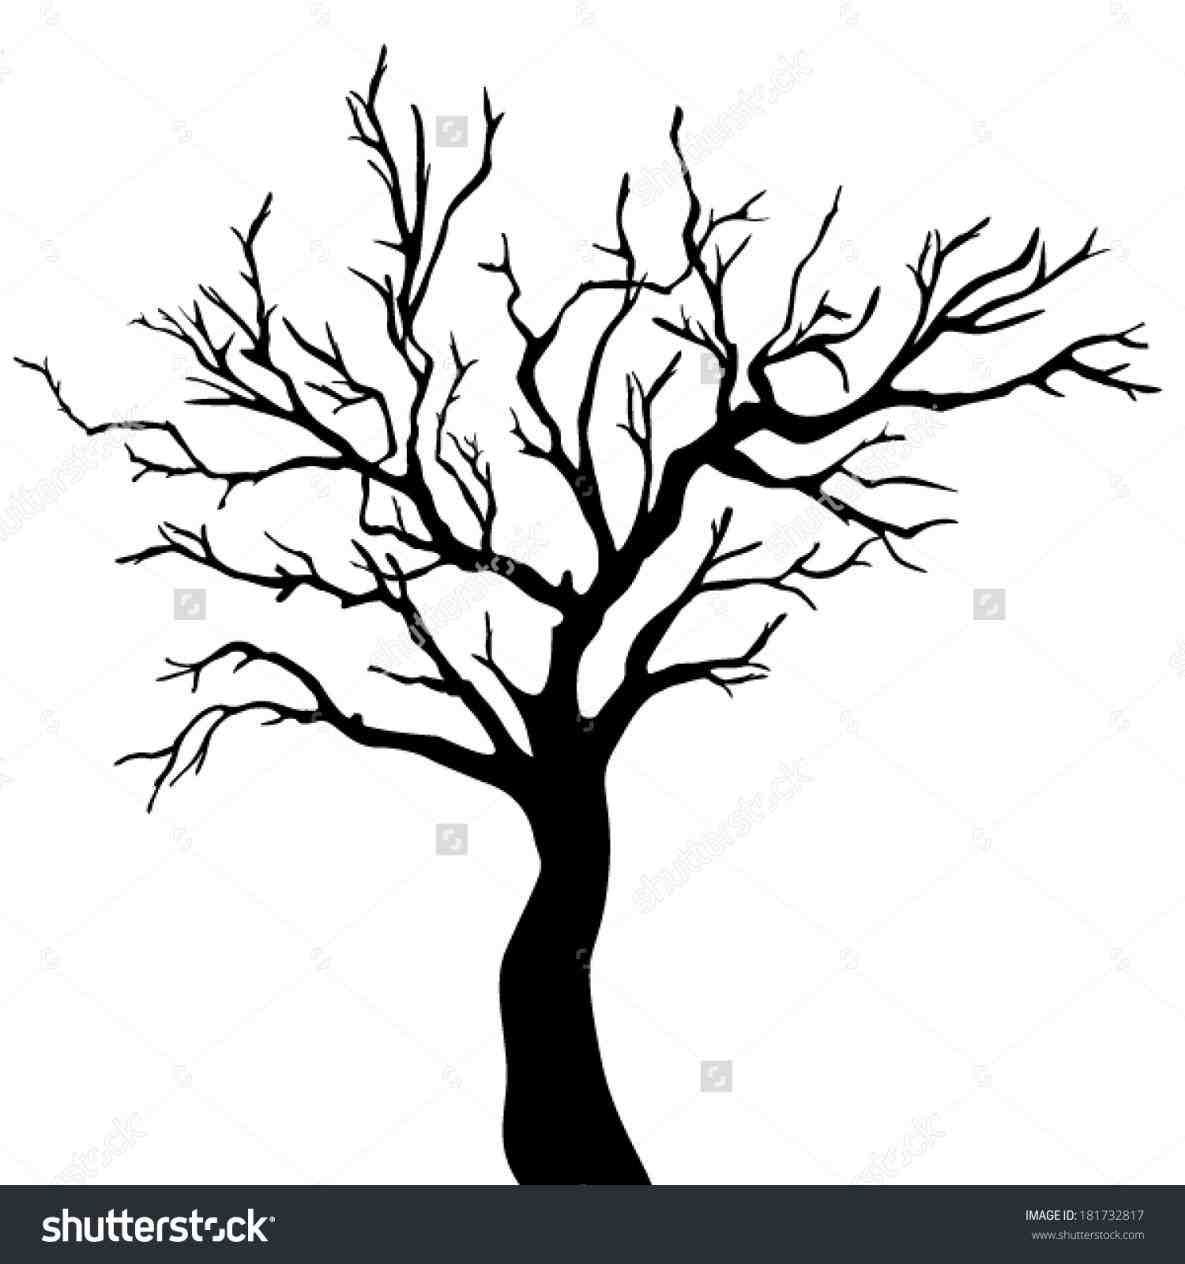 Dogwood Branch Drawing